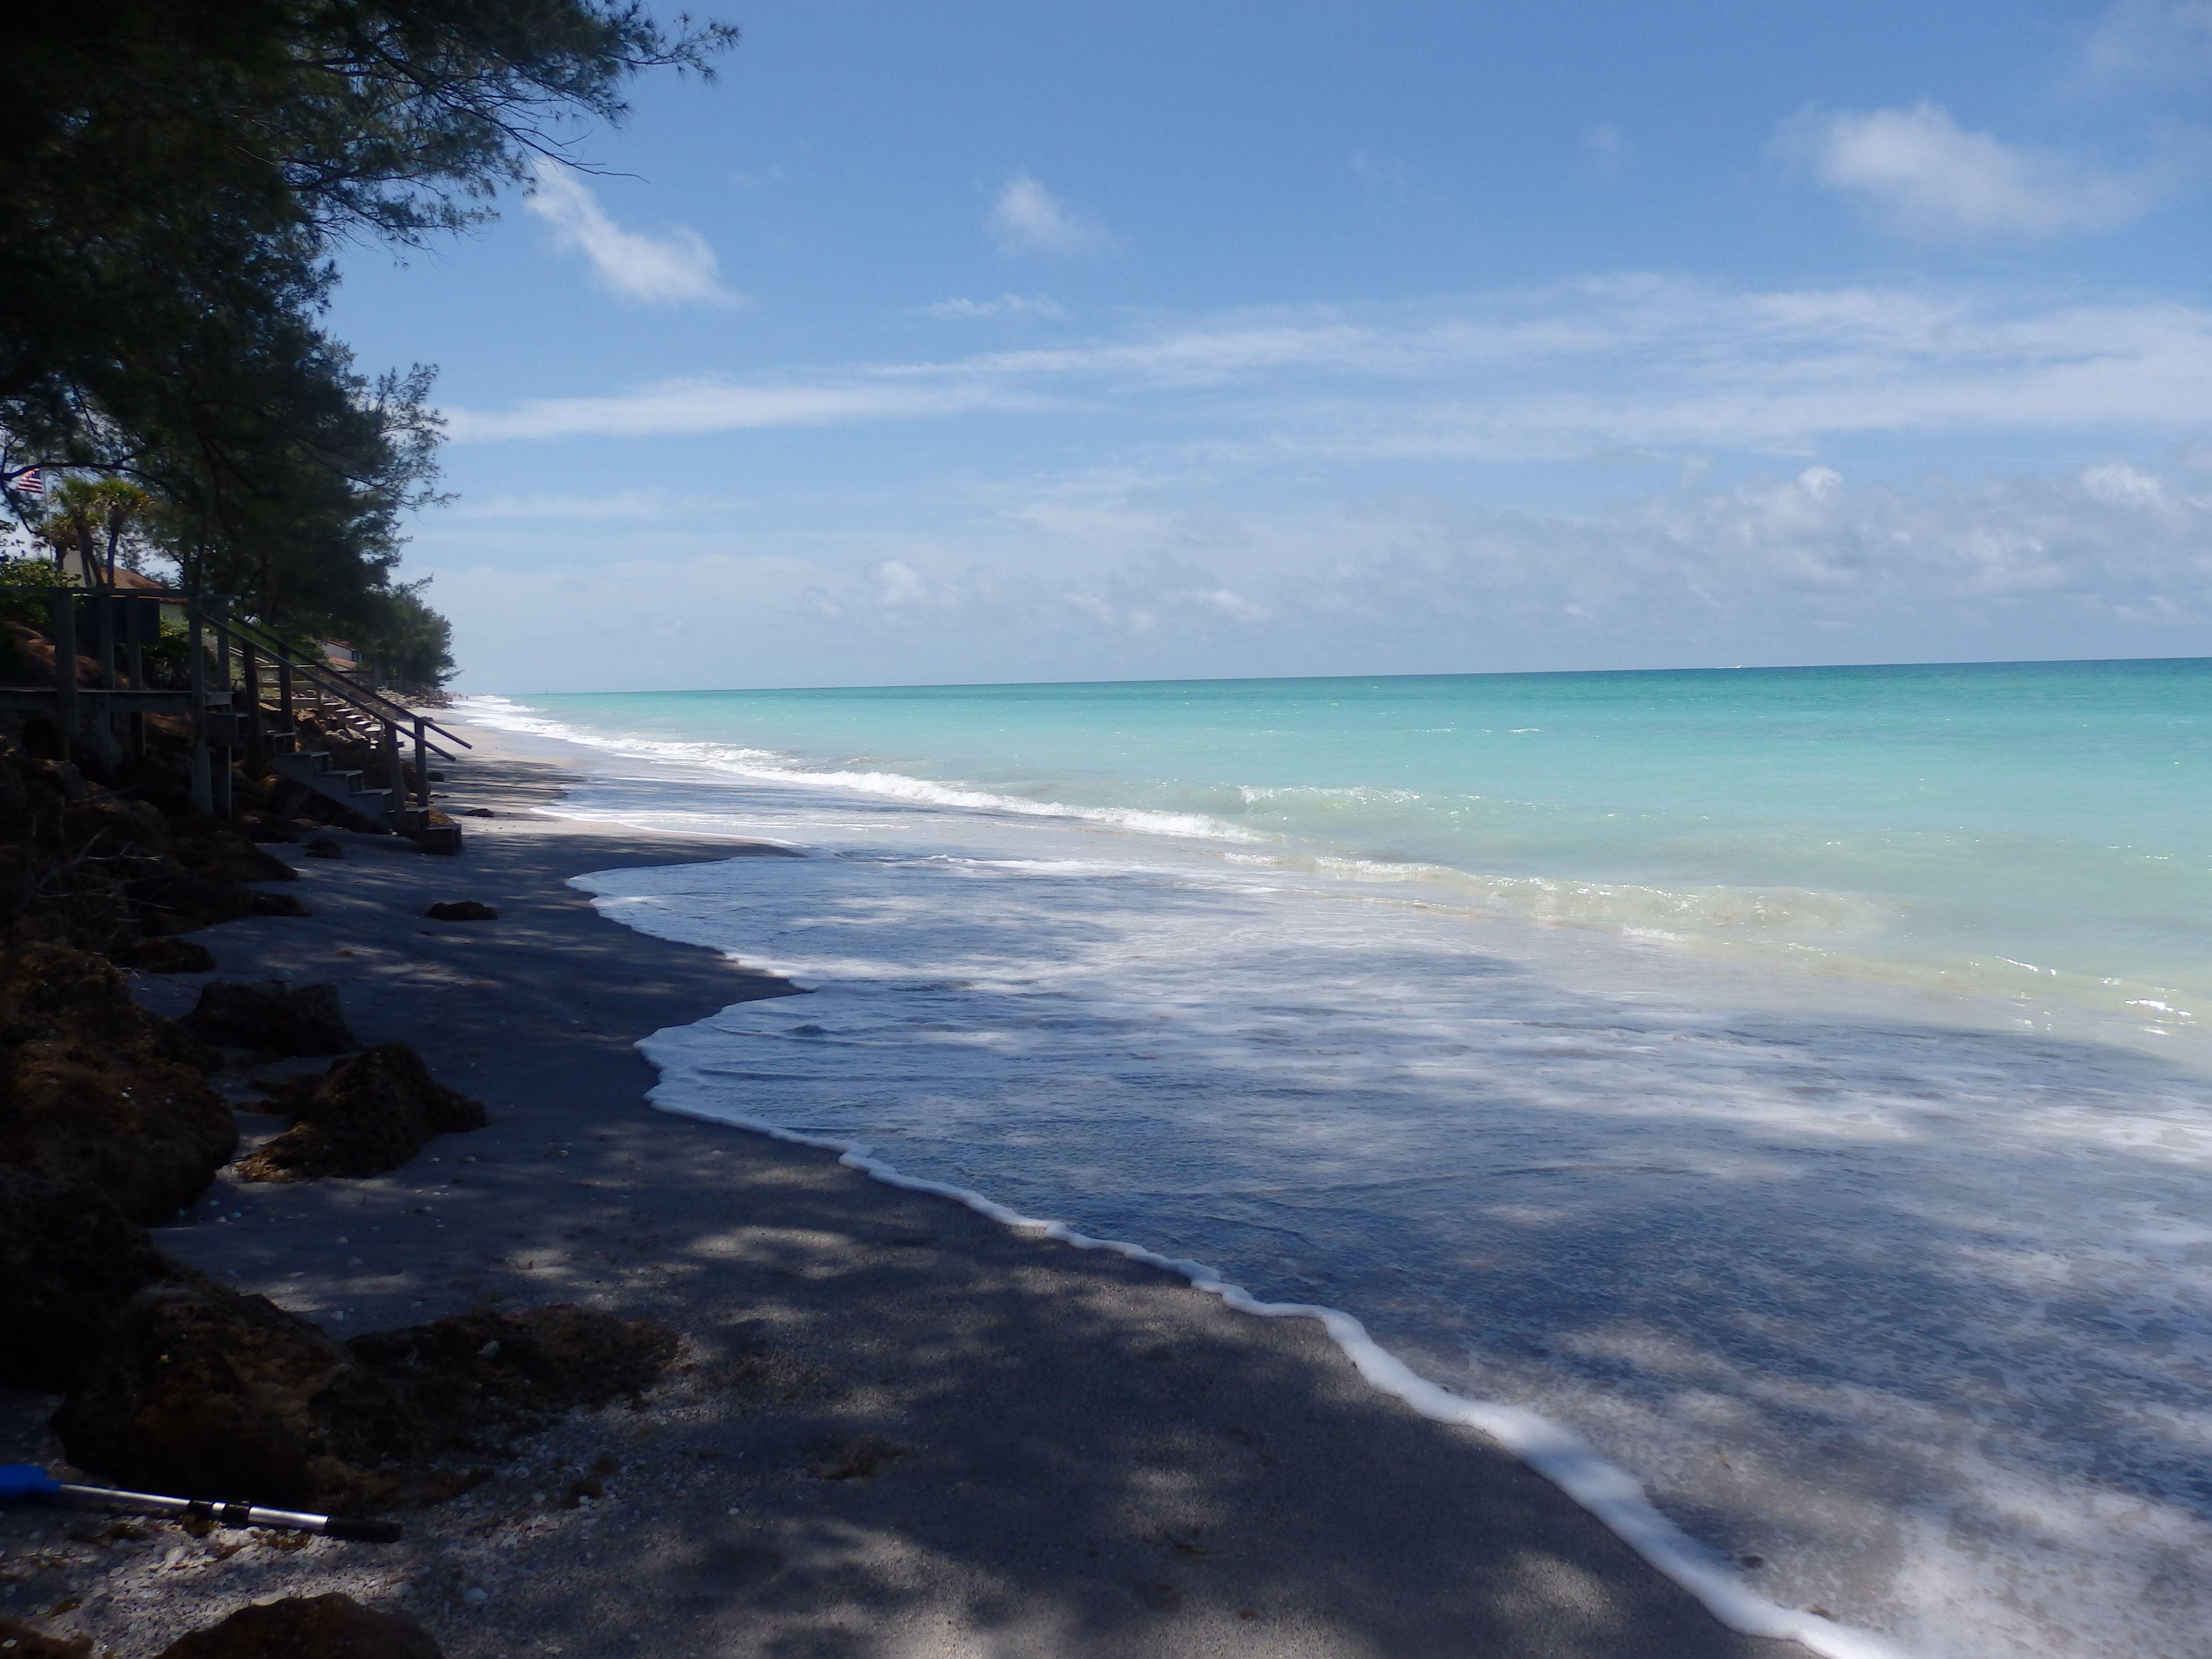 Beach on Manasota Key   Florida beaches, Beach, Manasota ...